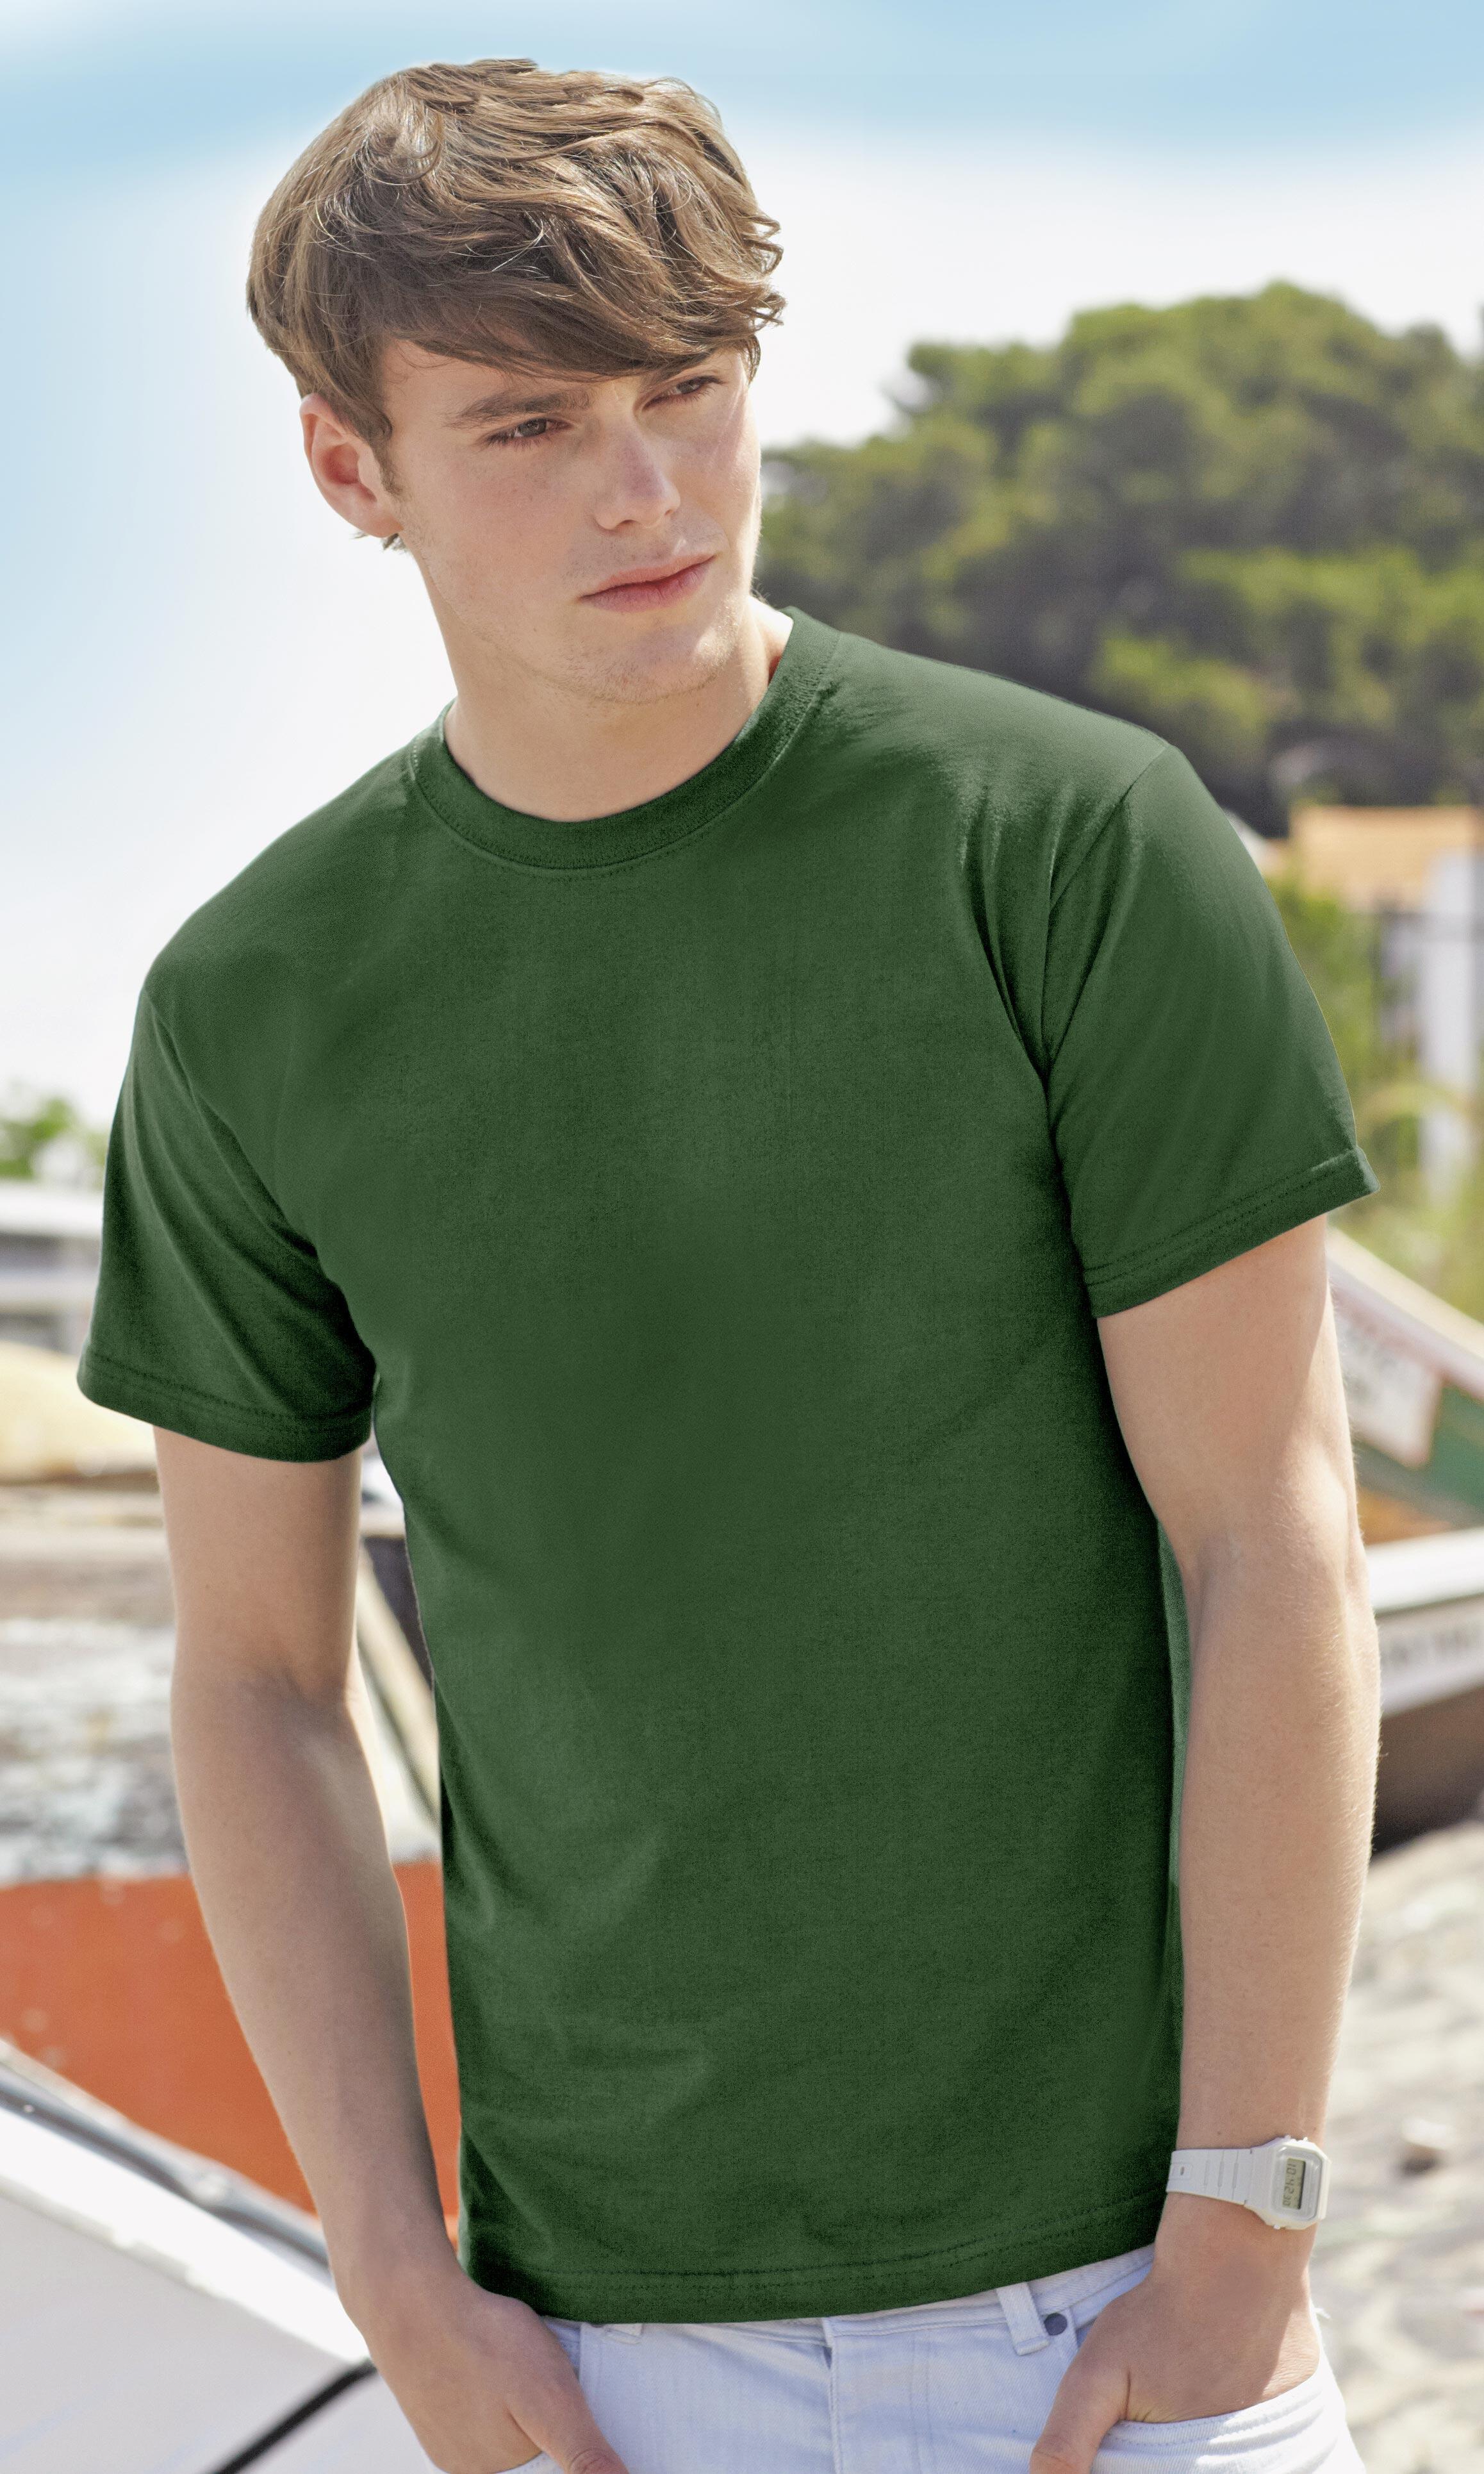 de991f3a466 A M Textile Solutions - Fruit Of The Loom Super Premium T-Shirt